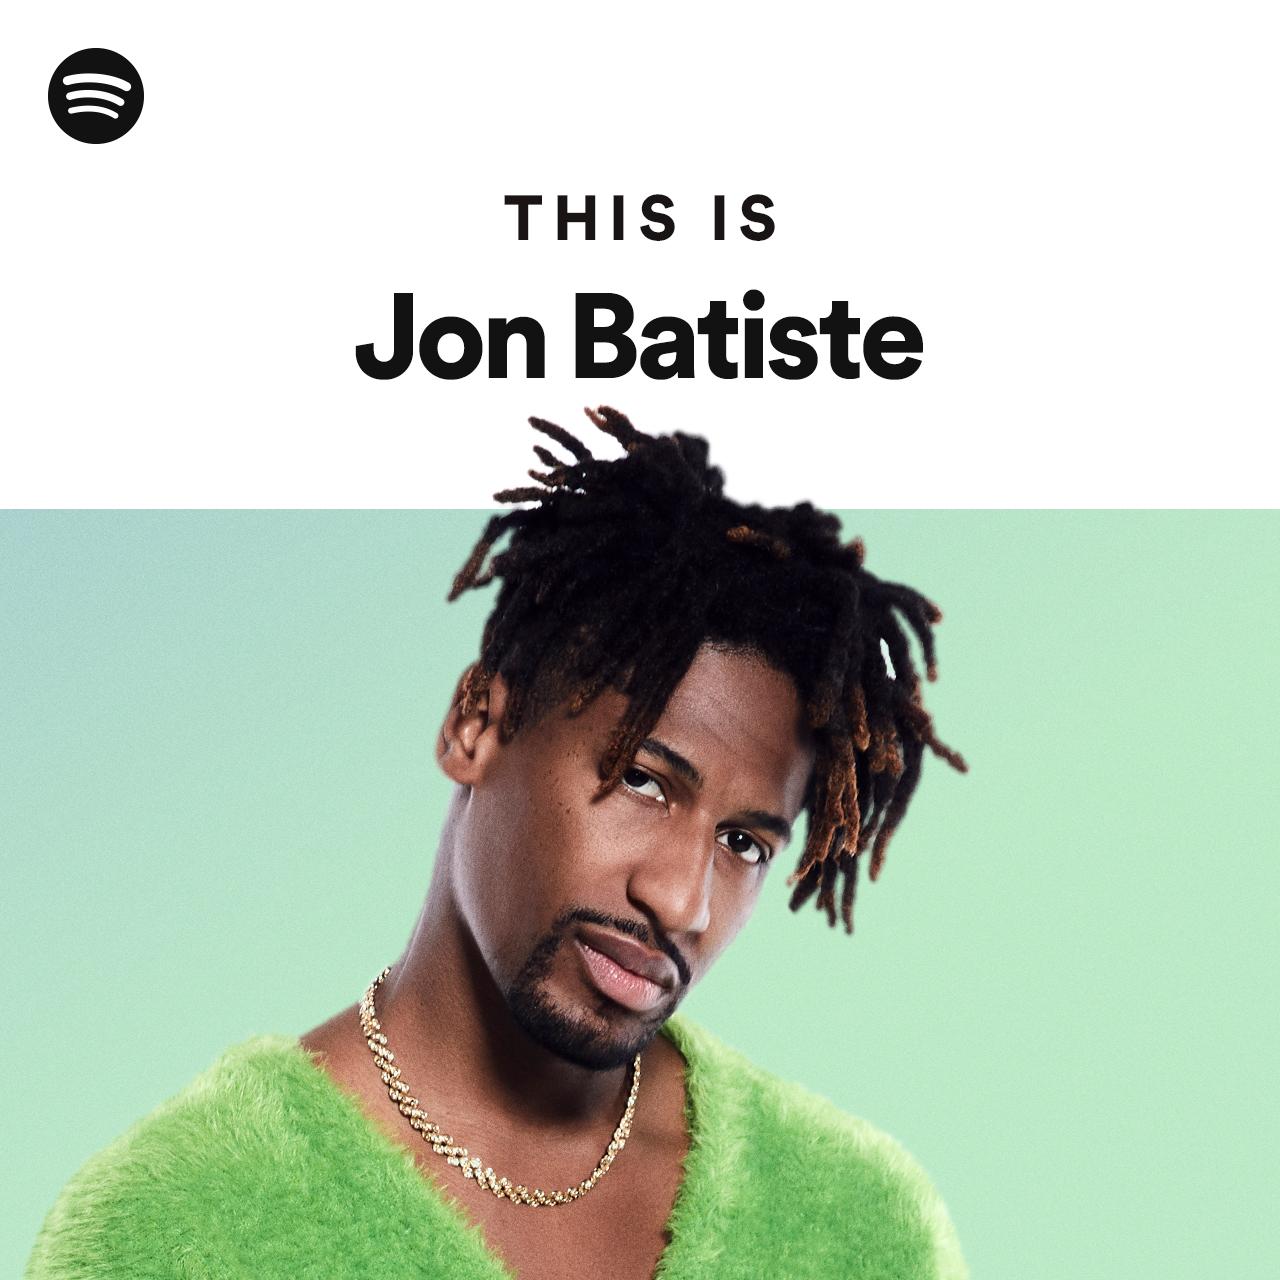 This Is Jon Batisteのサムネイル